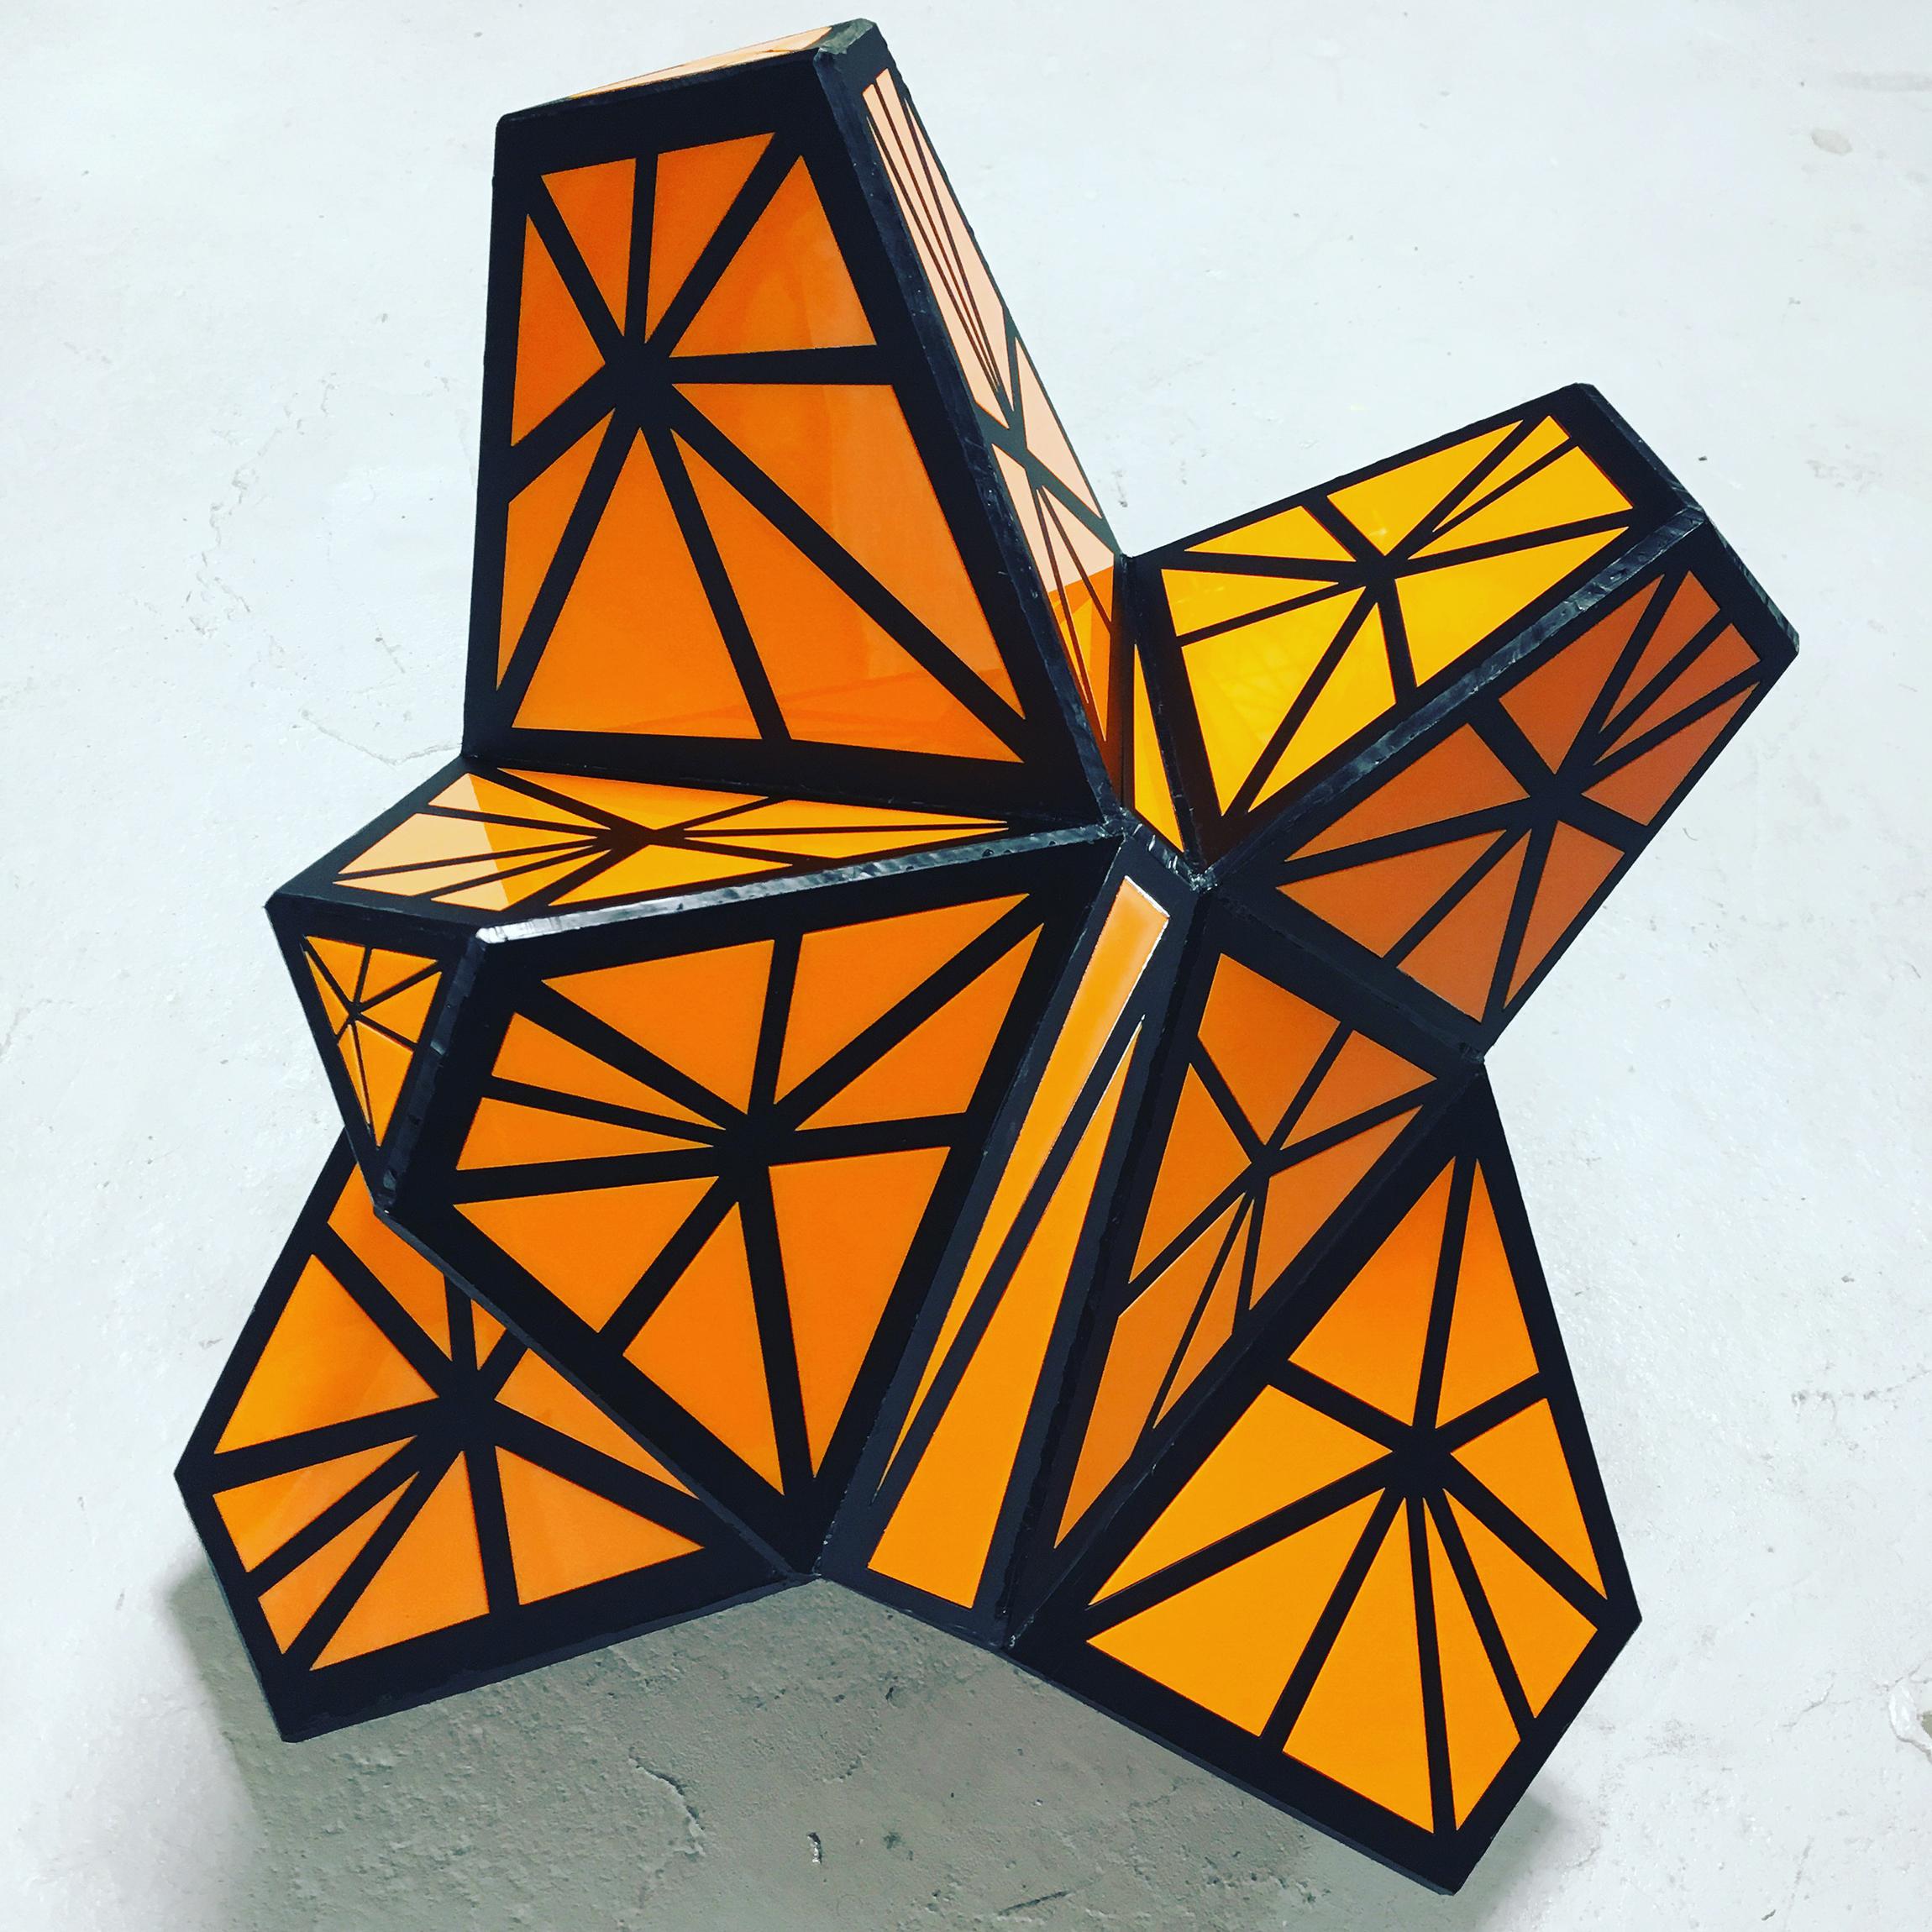 hendee_monarch sculpture